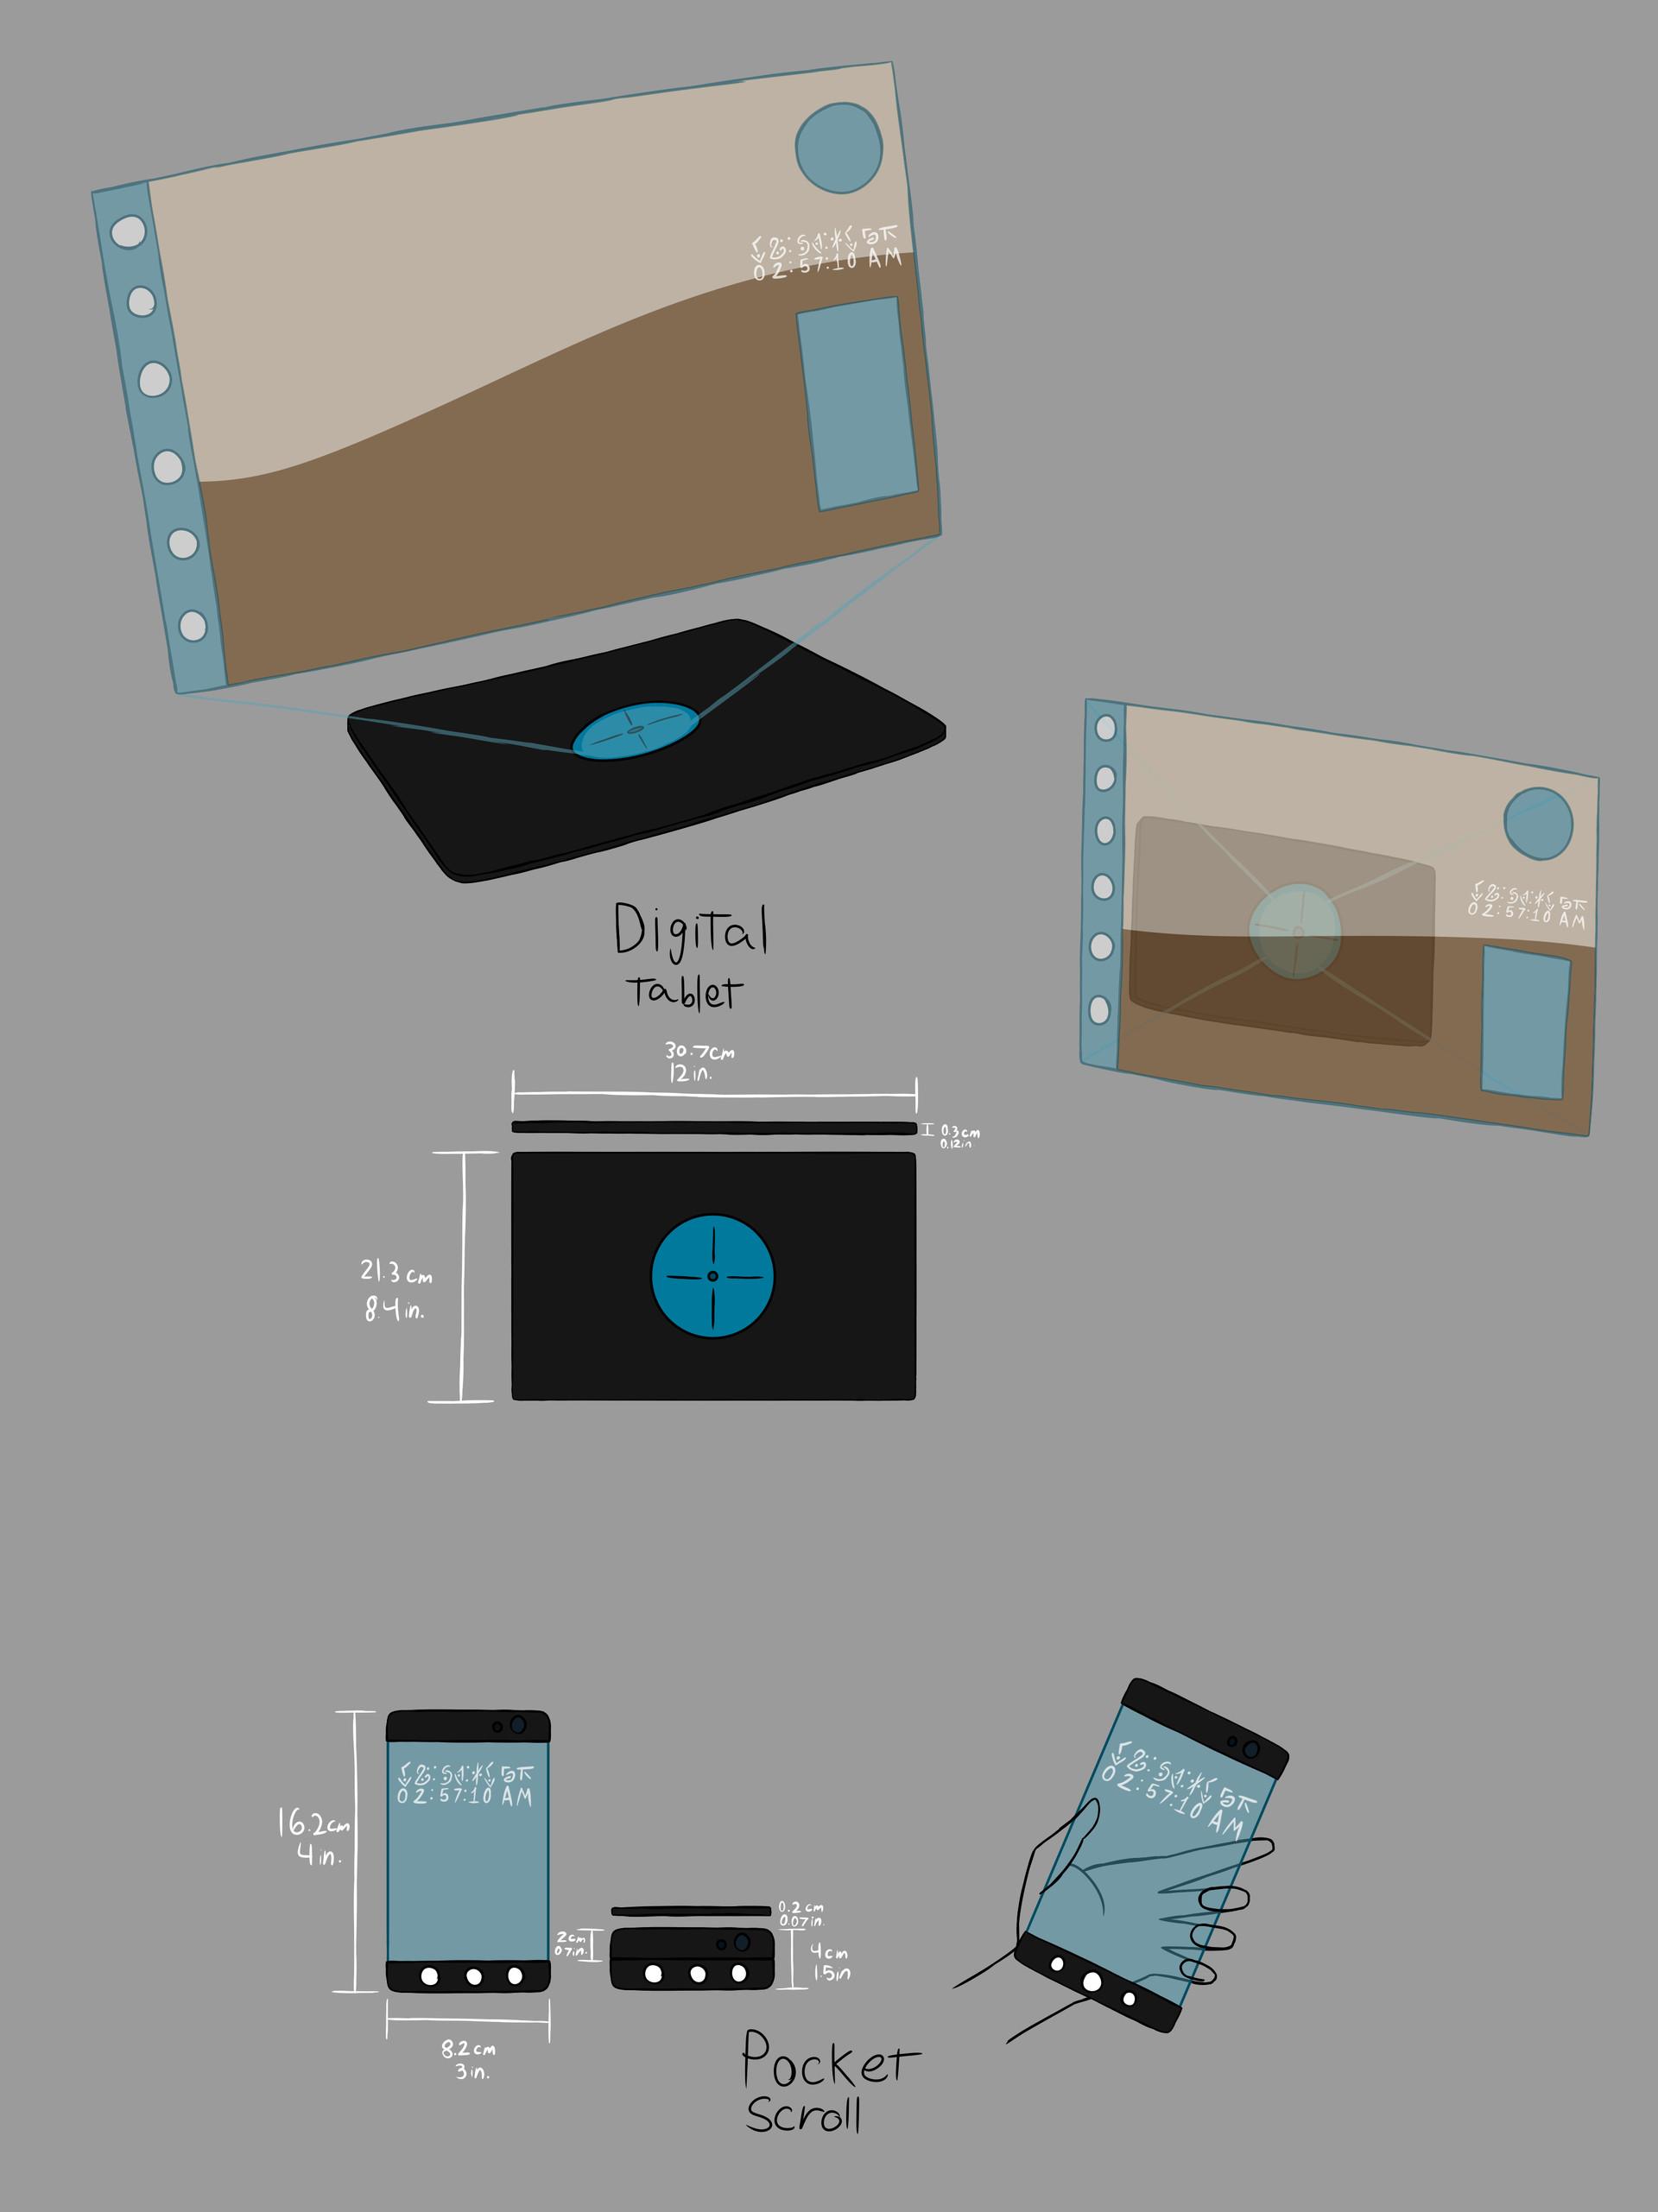 Amazing Artstation Digital Tablet And Pocket Scroll Ashton Waltz Download Free Architecture Designs Rallybritishbridgeorg